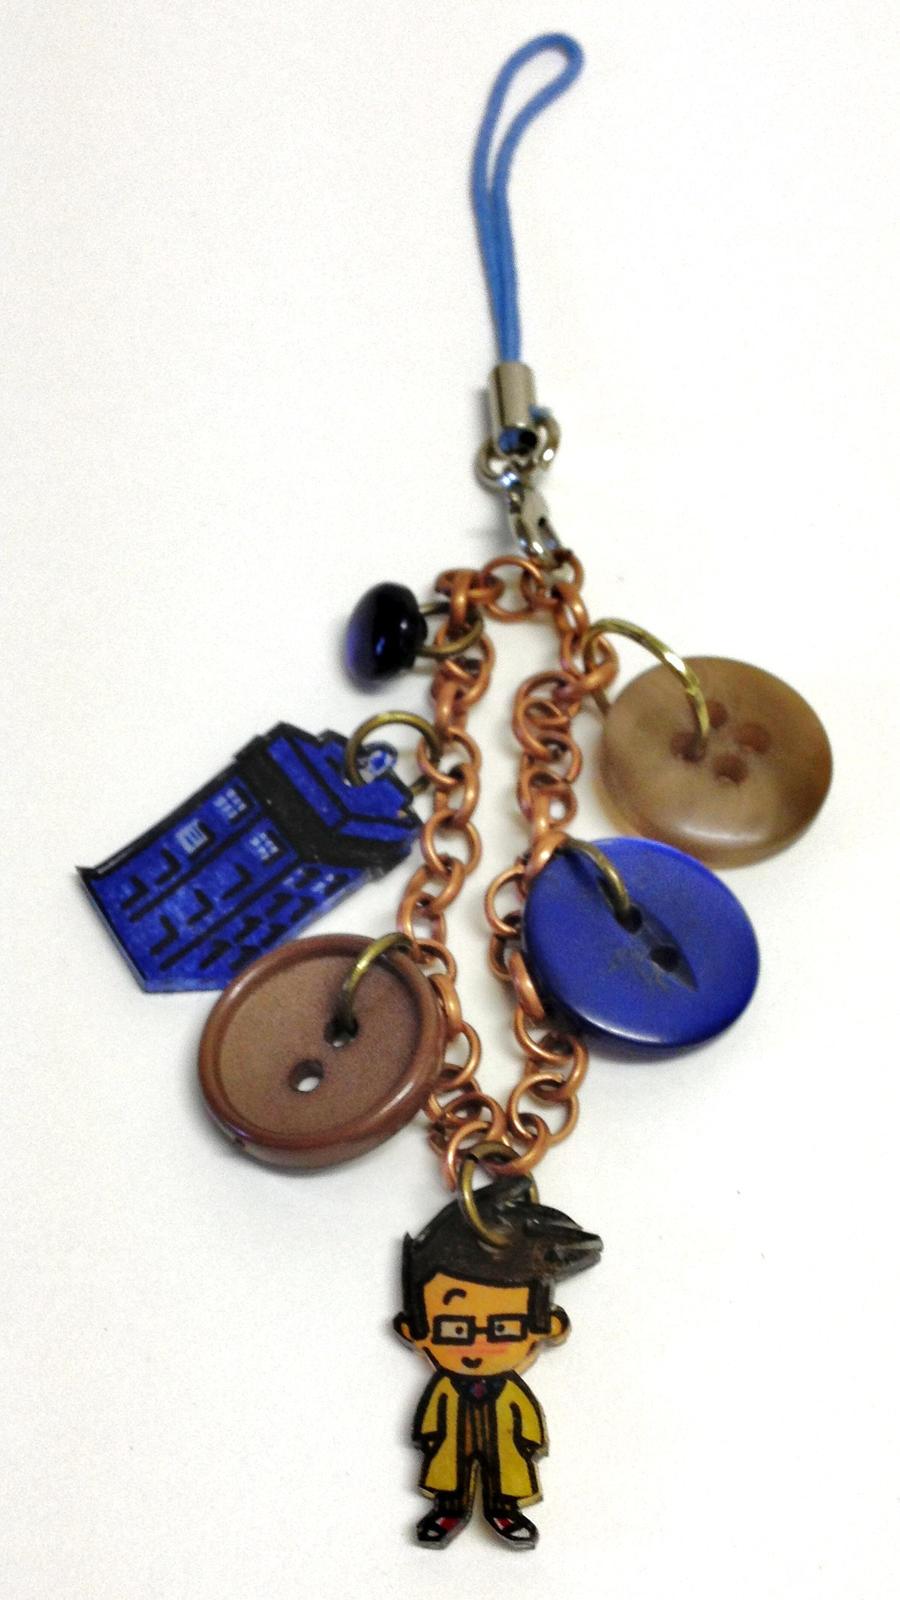 Kawaii Doctor TARDIS handbag charm by Lovelyruthie